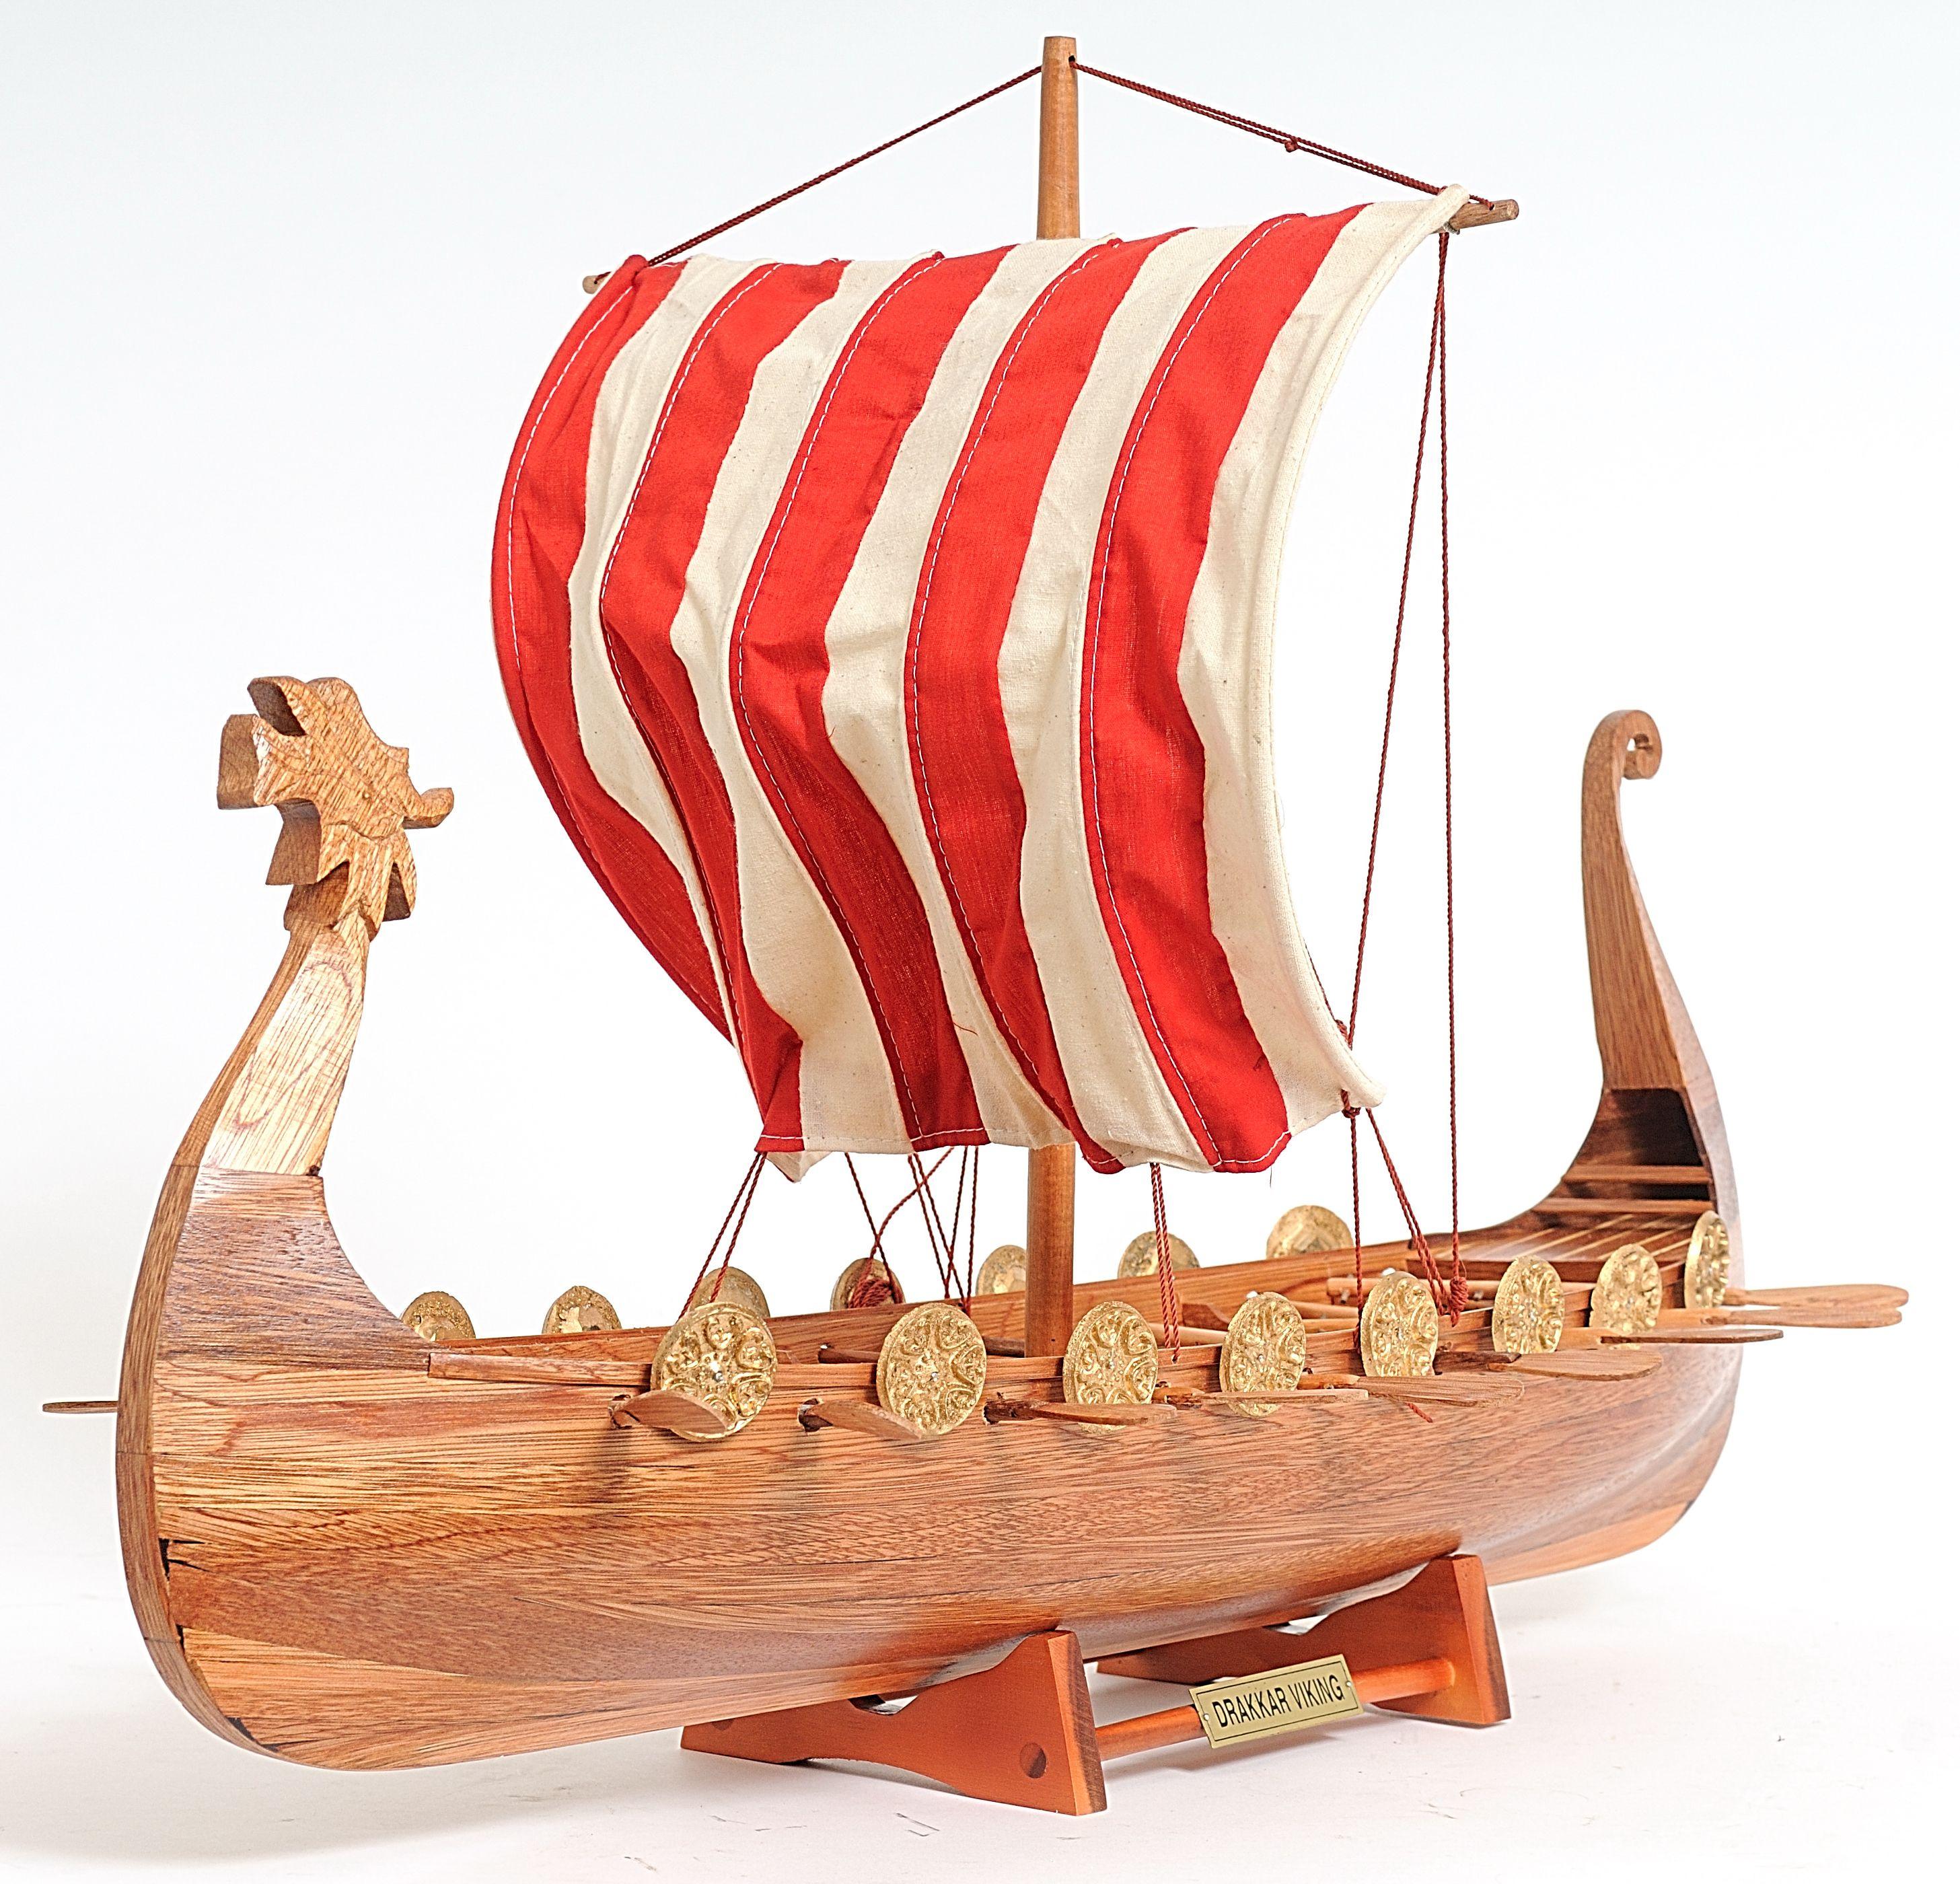 2237-13175-Drakkar-Viking-Wooden-Model-Ship